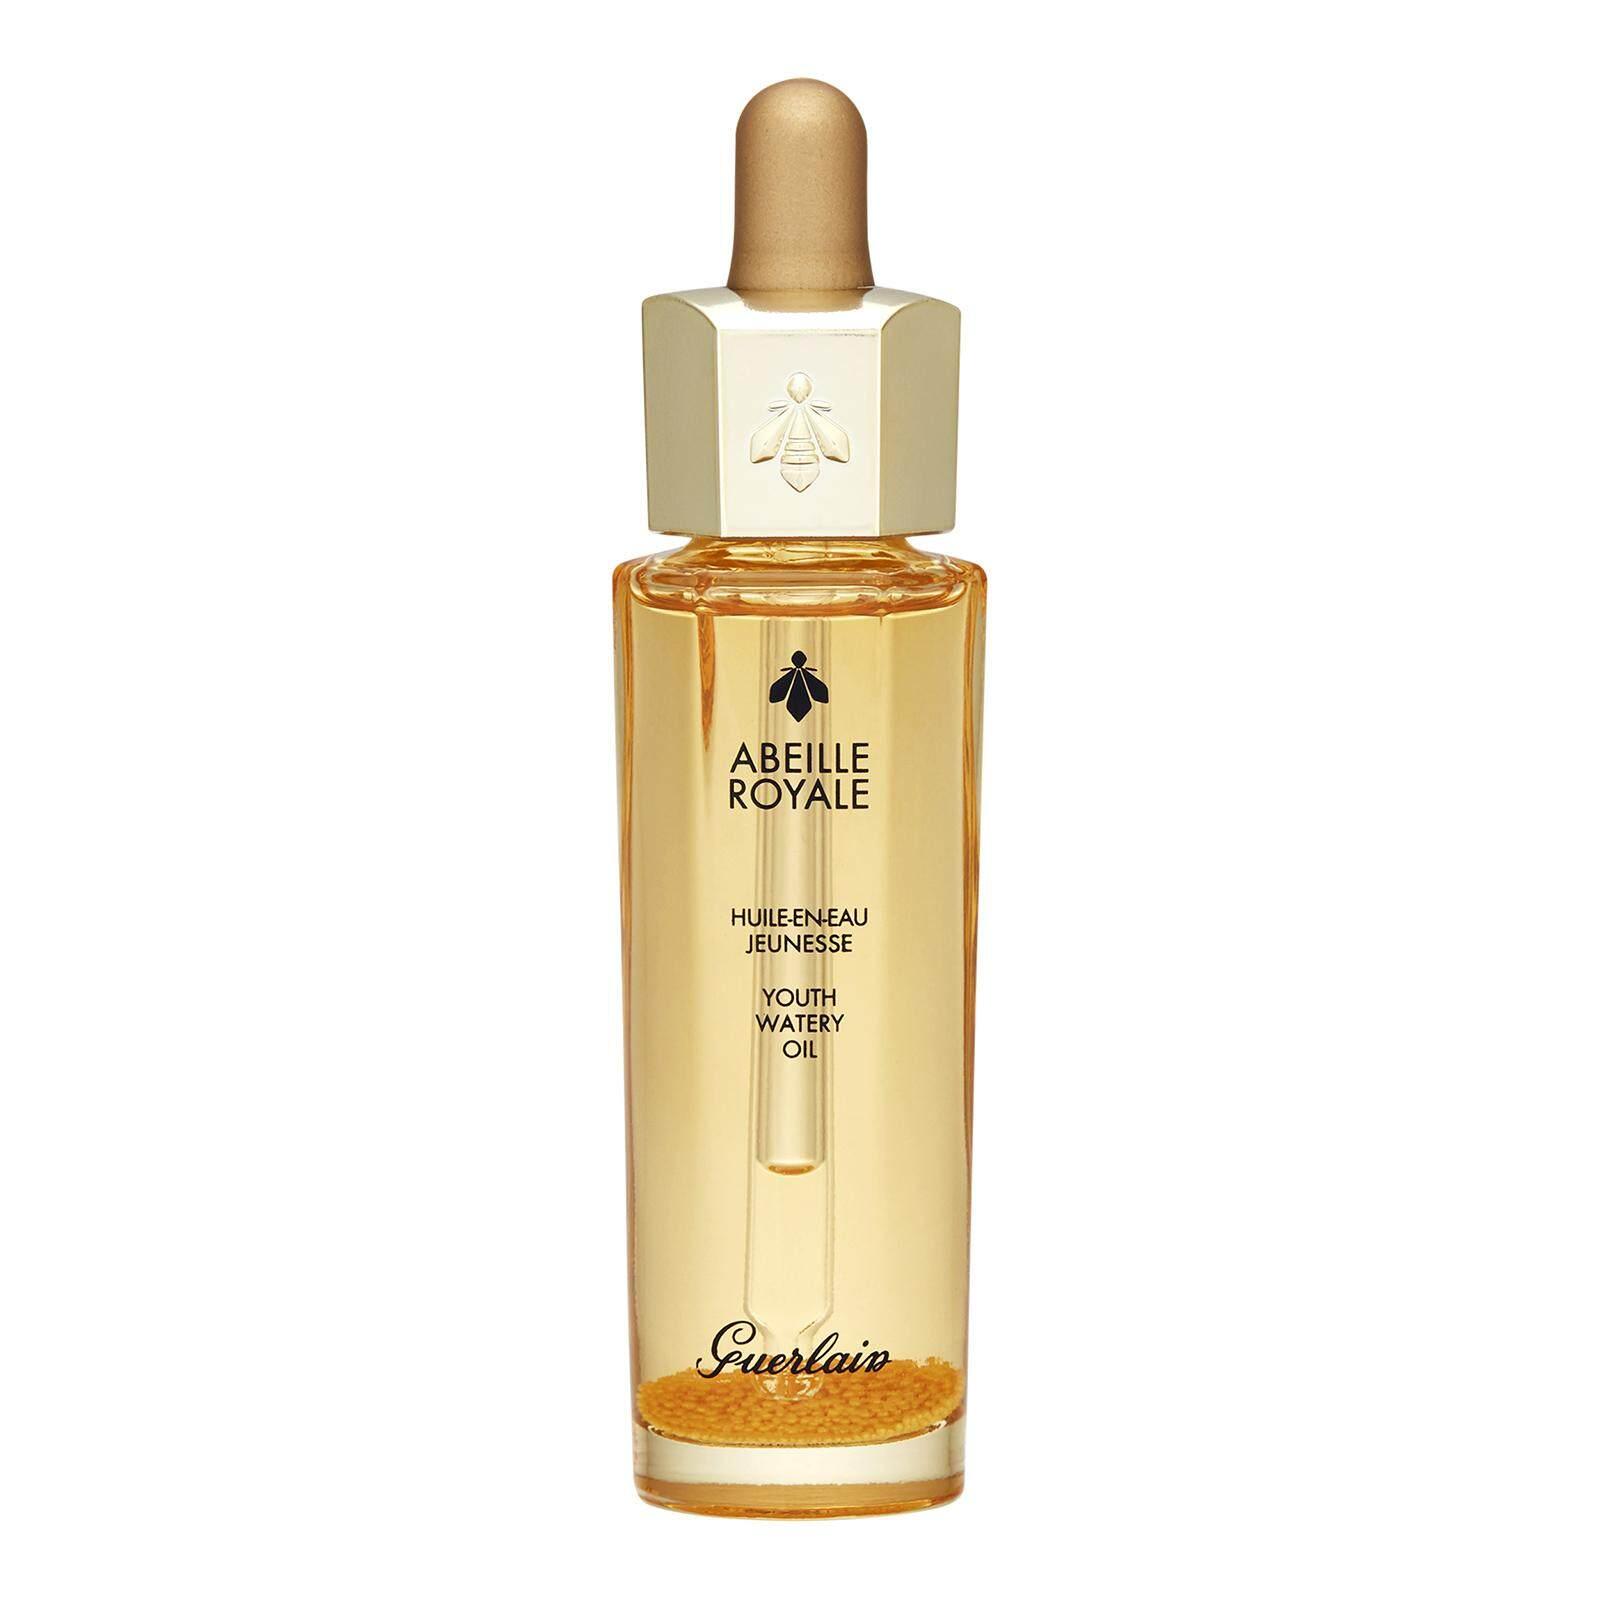 Buy Guerlain Womens Perfume Makeup Items Lazada Samsara Woman Edp 100 Ml Abeille Royale Youth Watery Oil 1oz 30ml Intl